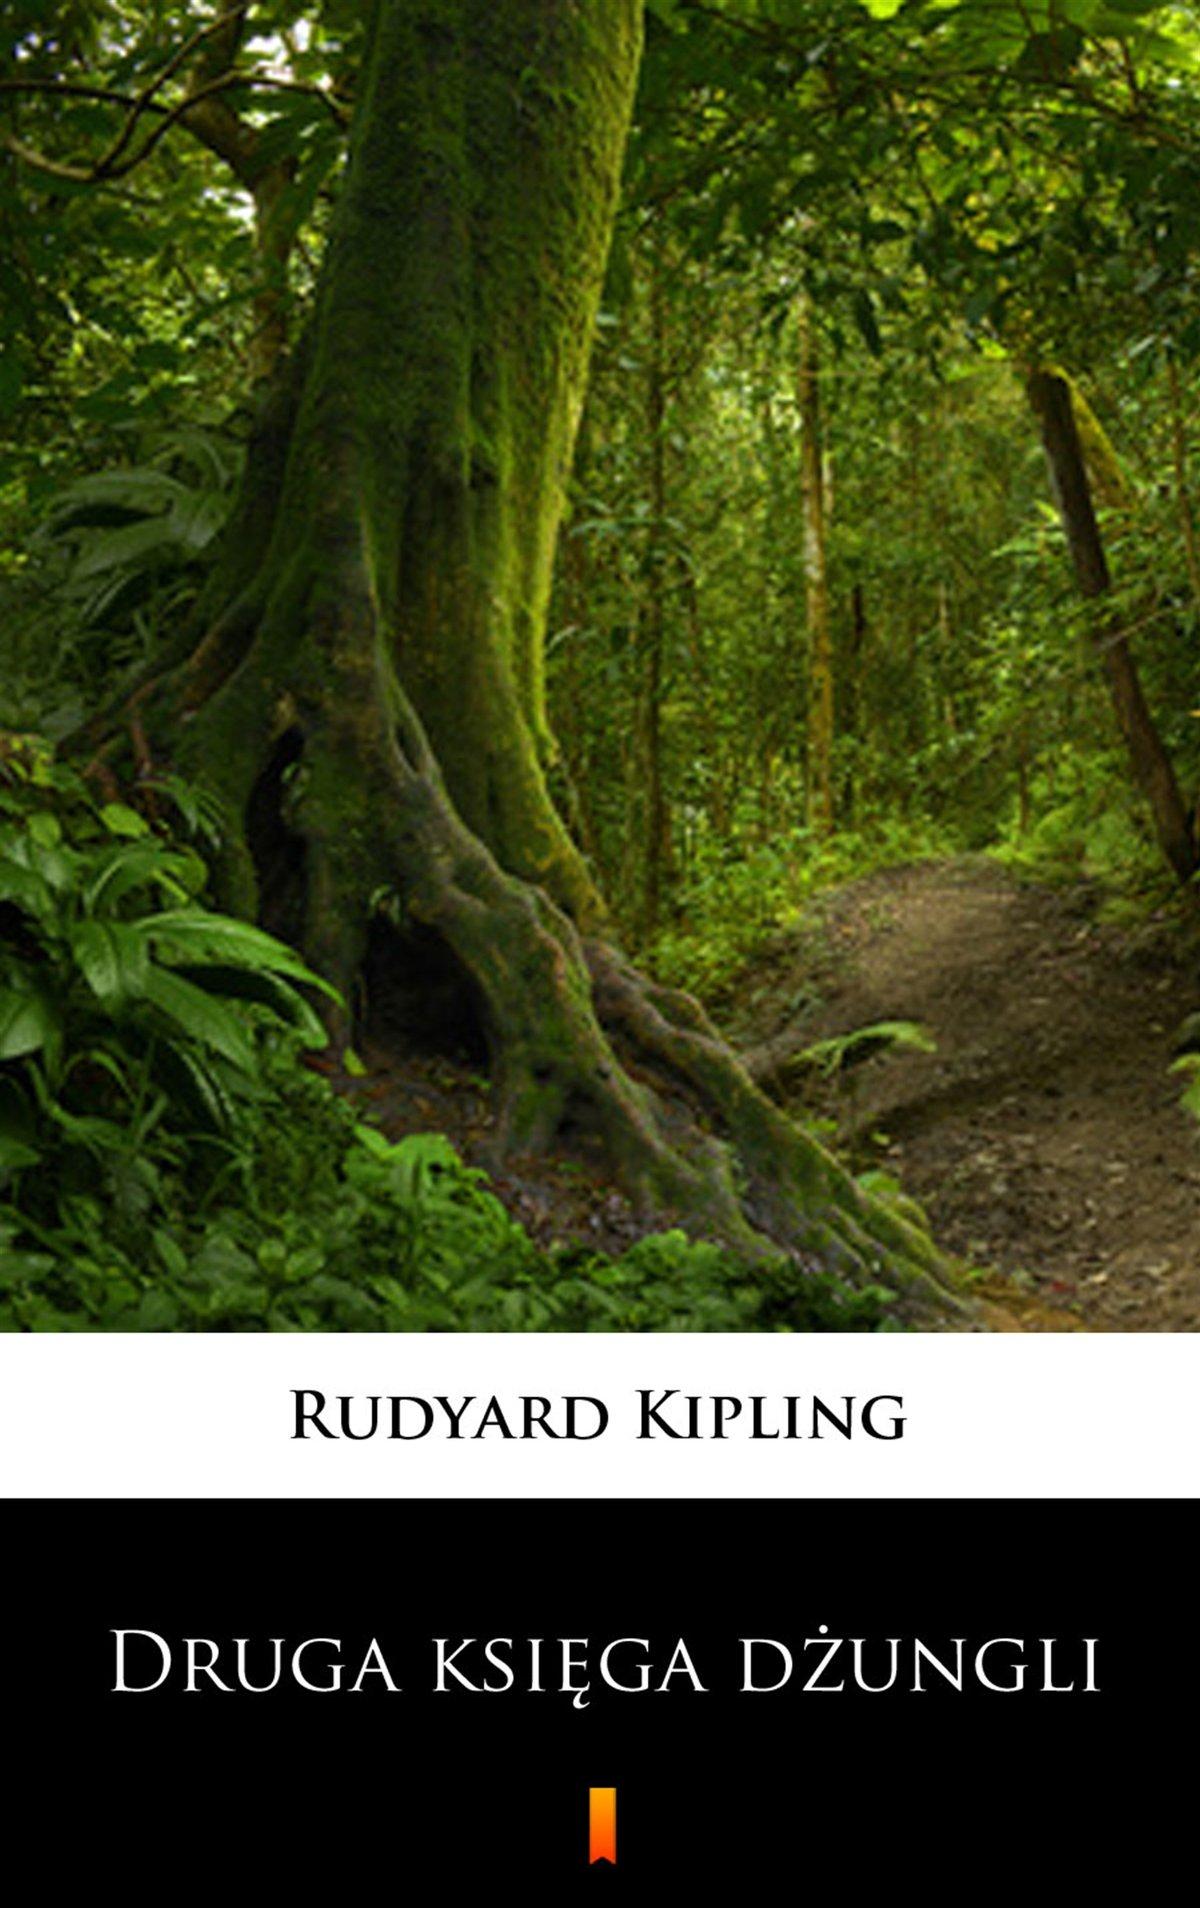 Druga księga dżungli - Ebook (Książka na Kindle) do pobrania w formacie MOBI